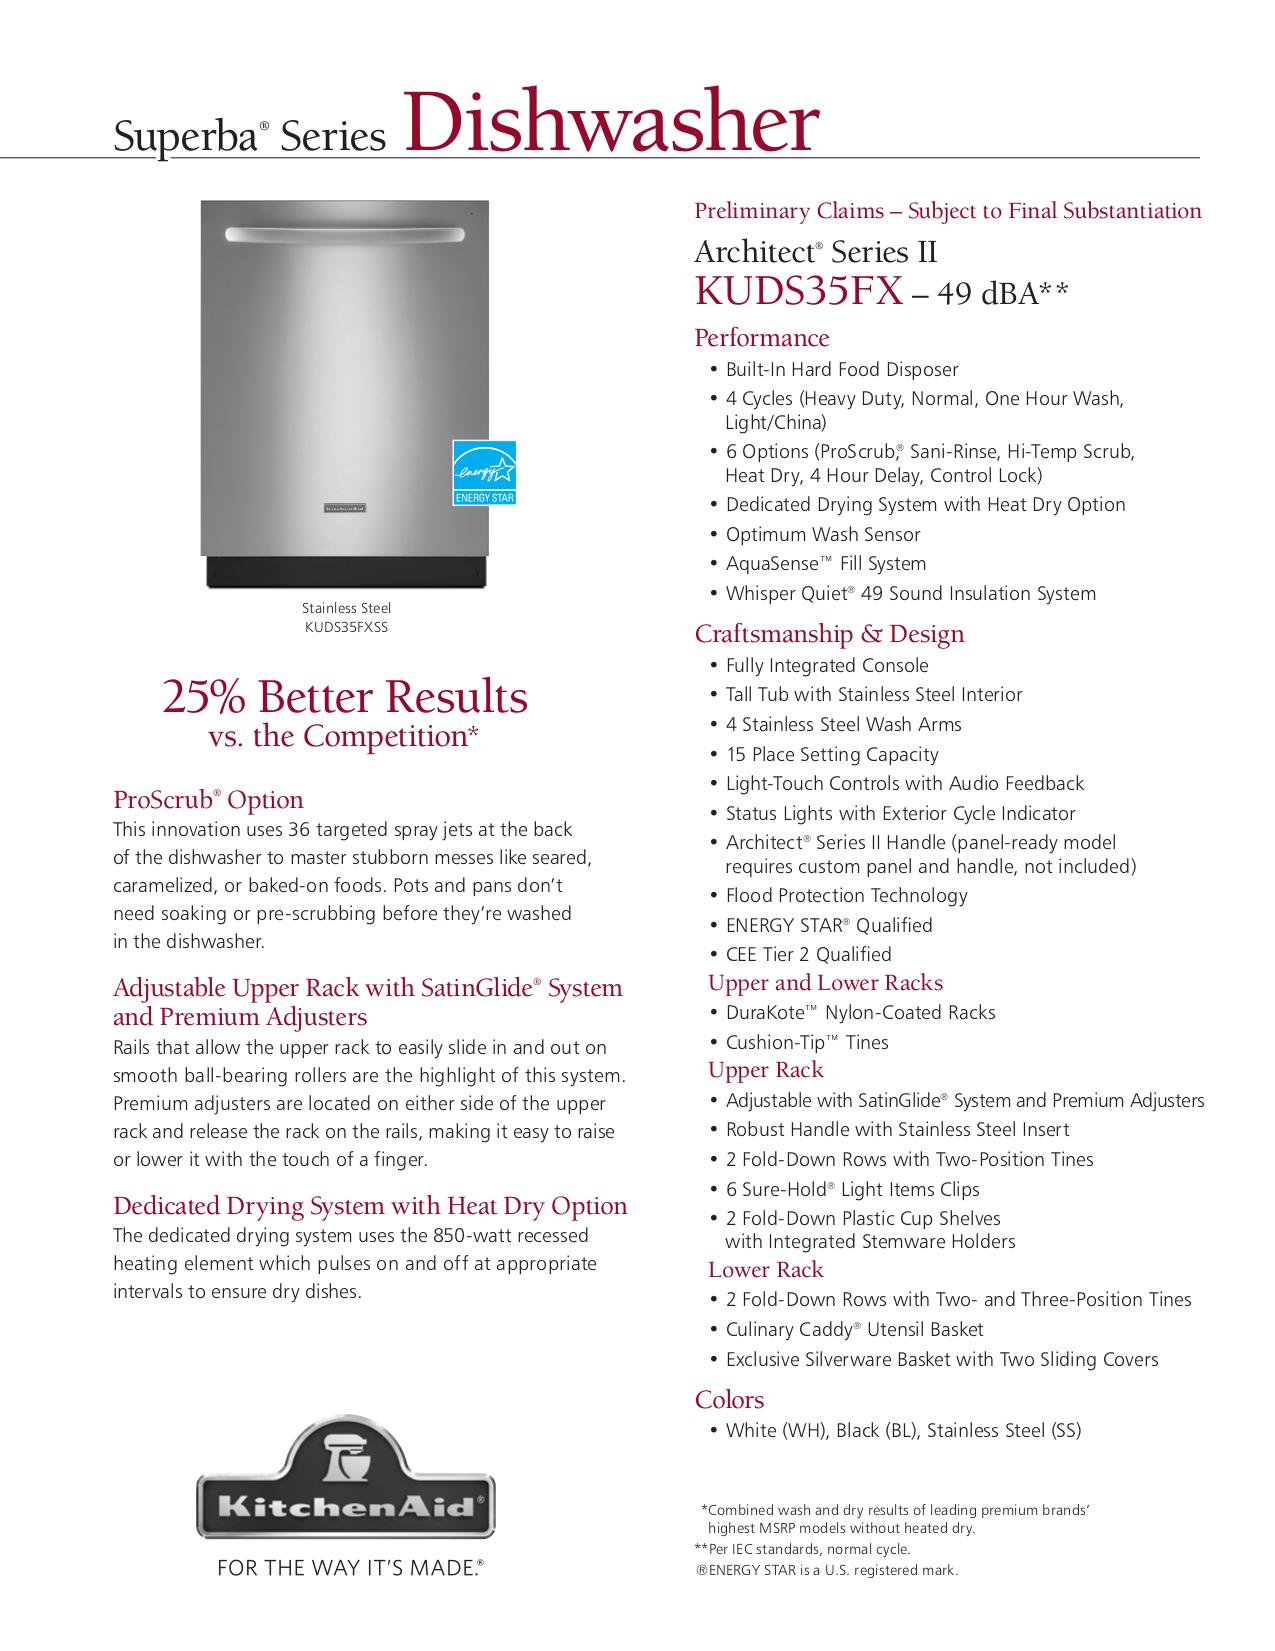 download free pdf for kitchenaid kuds35fx dishwasher manual rh umlib com kitchenaid dishwasher manual kdte254ess2 kitchenaid dishwasher manual kdte254ess1